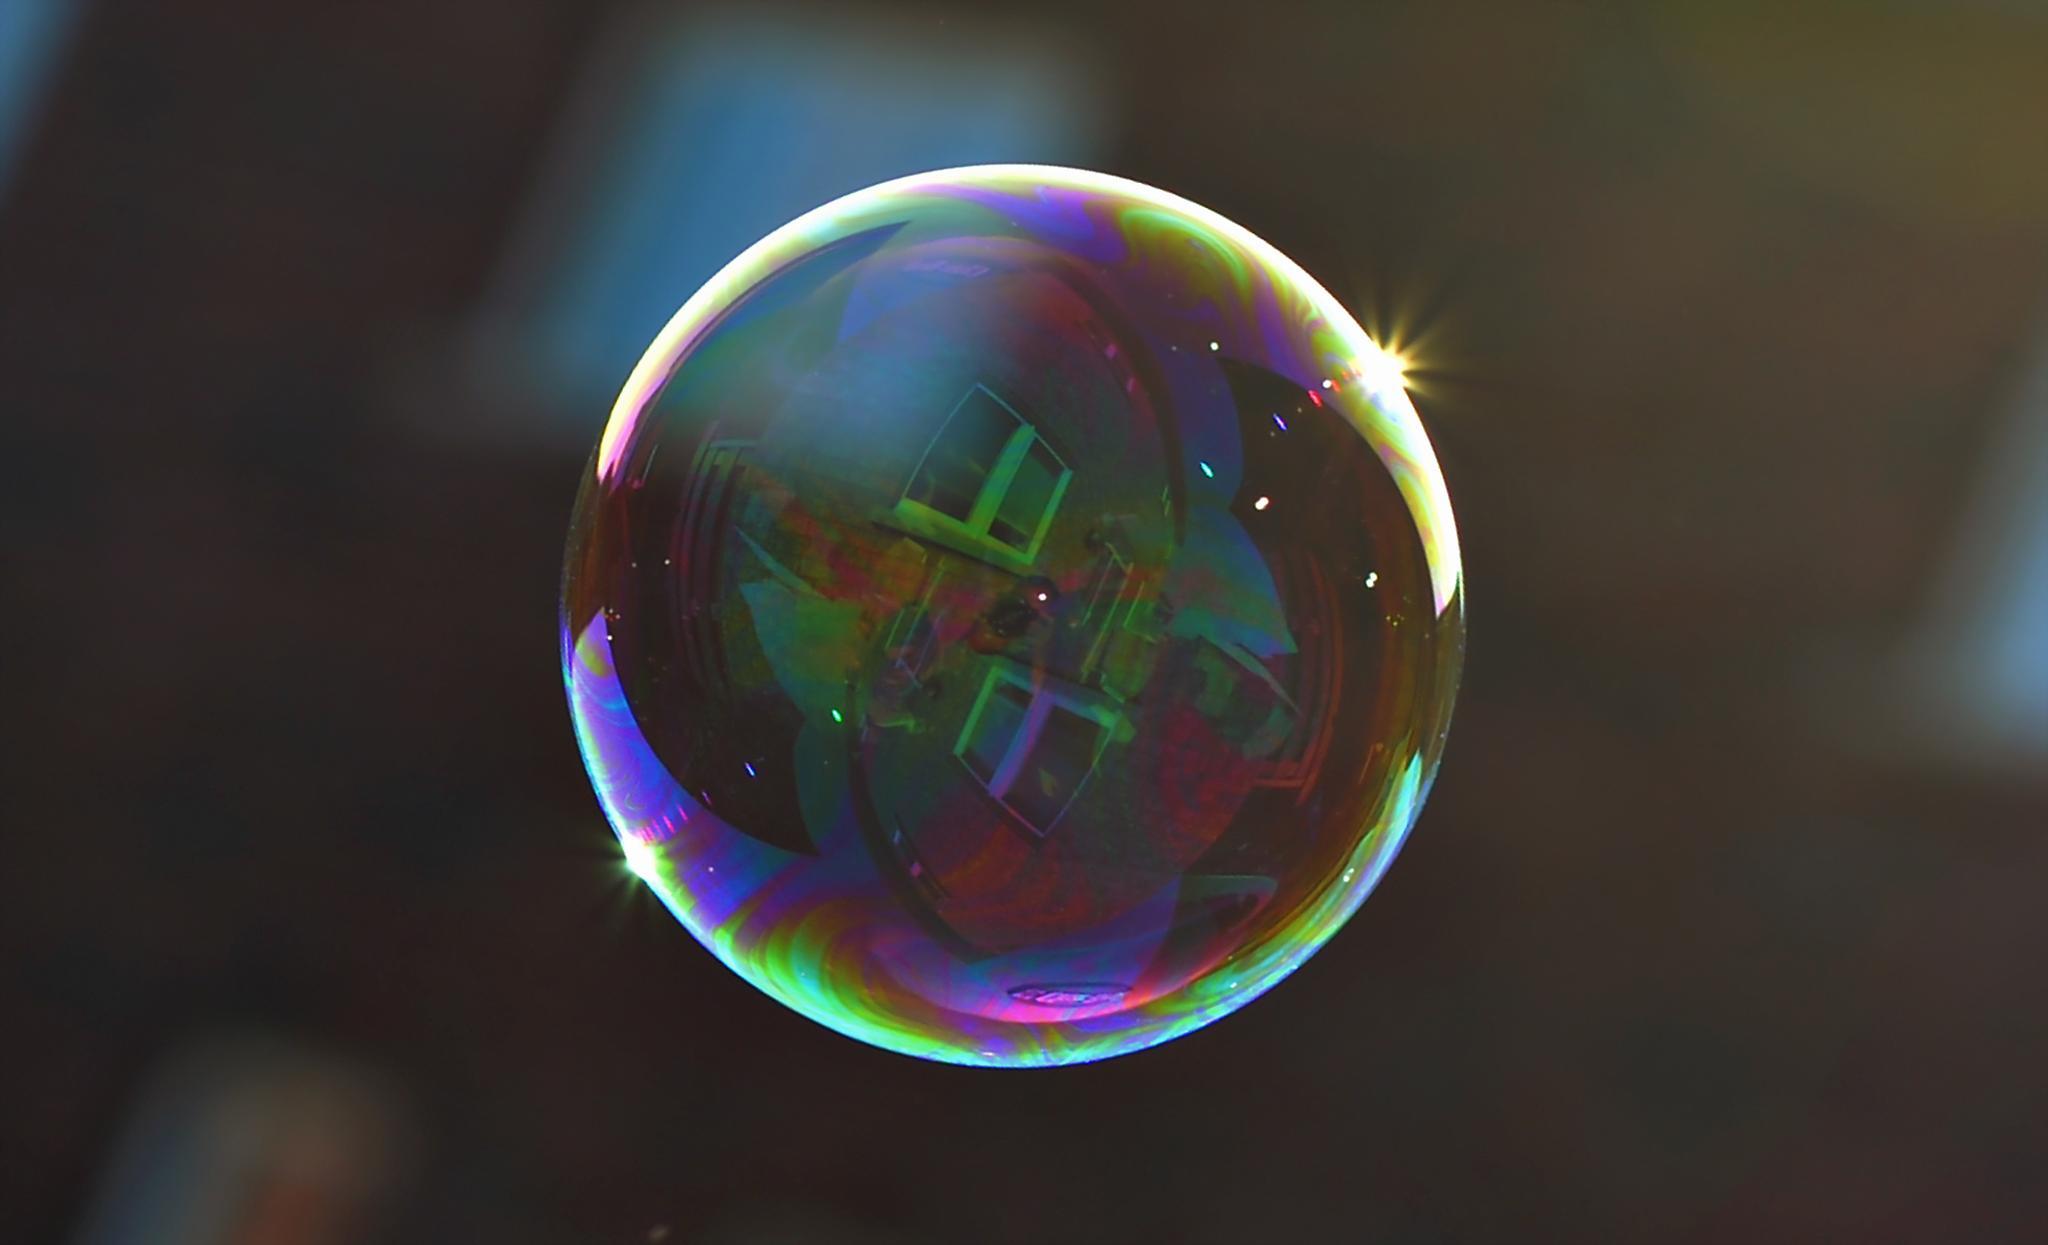 Bubble by David Lam